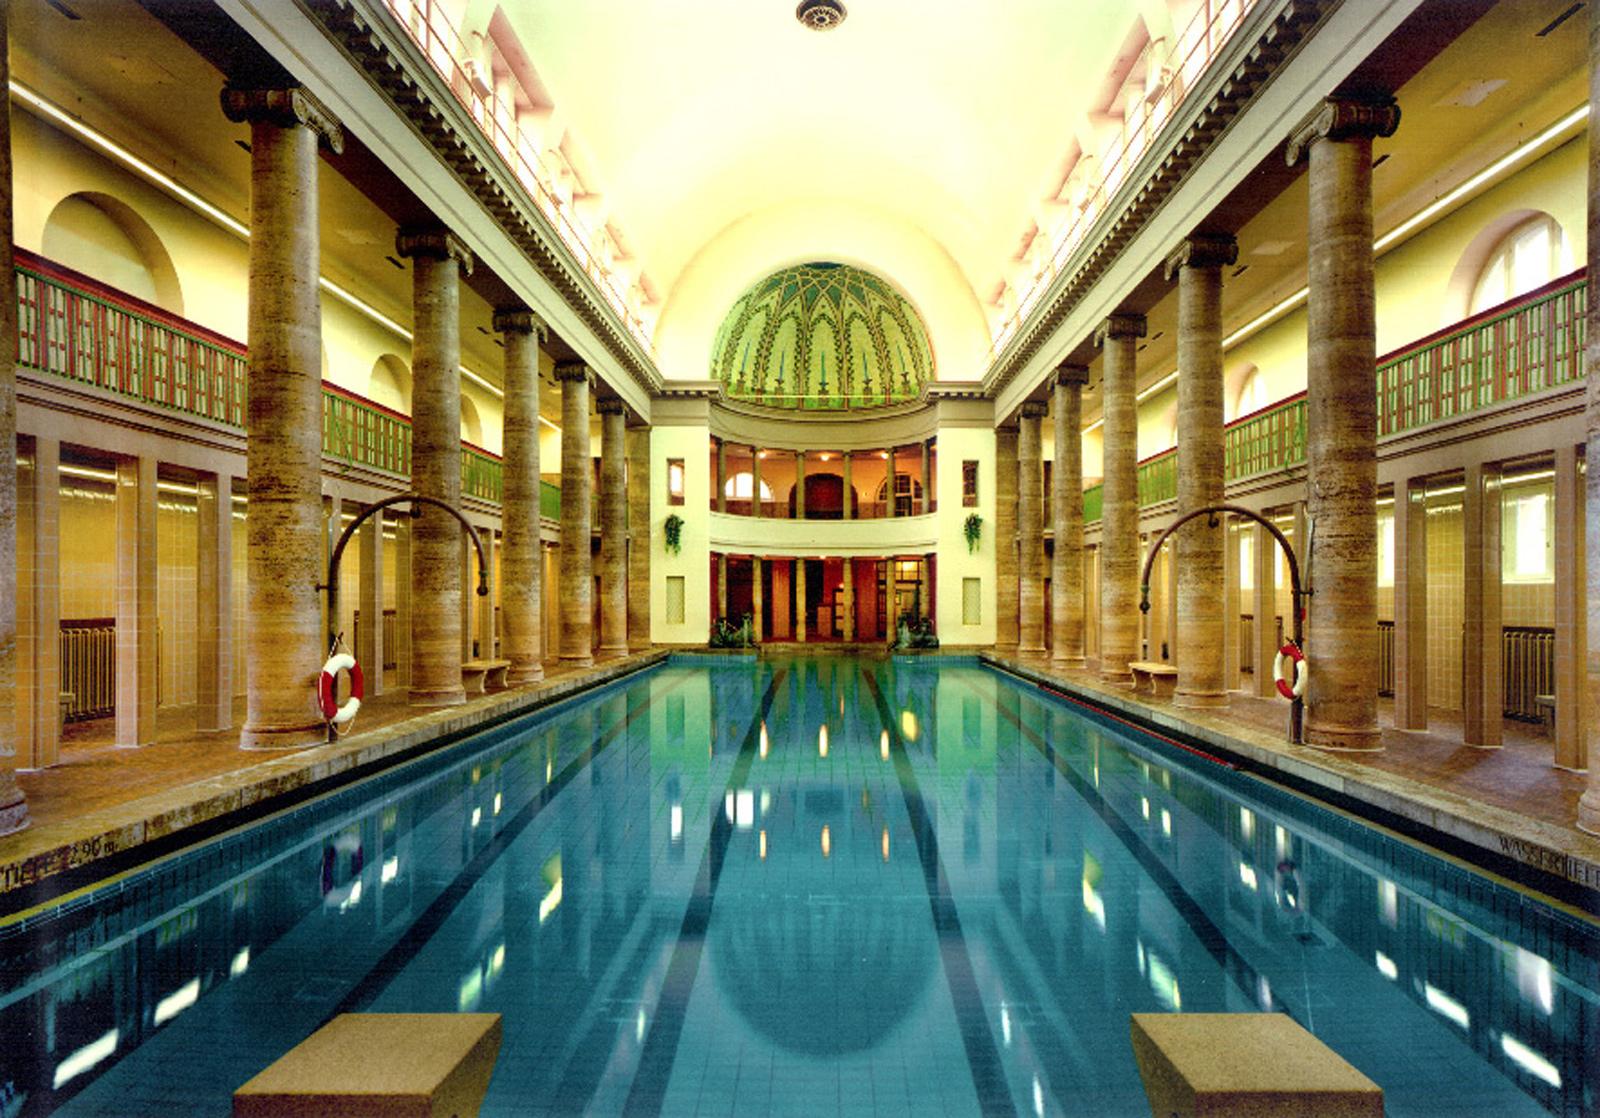 Stadtbad Neukölln swimming pool